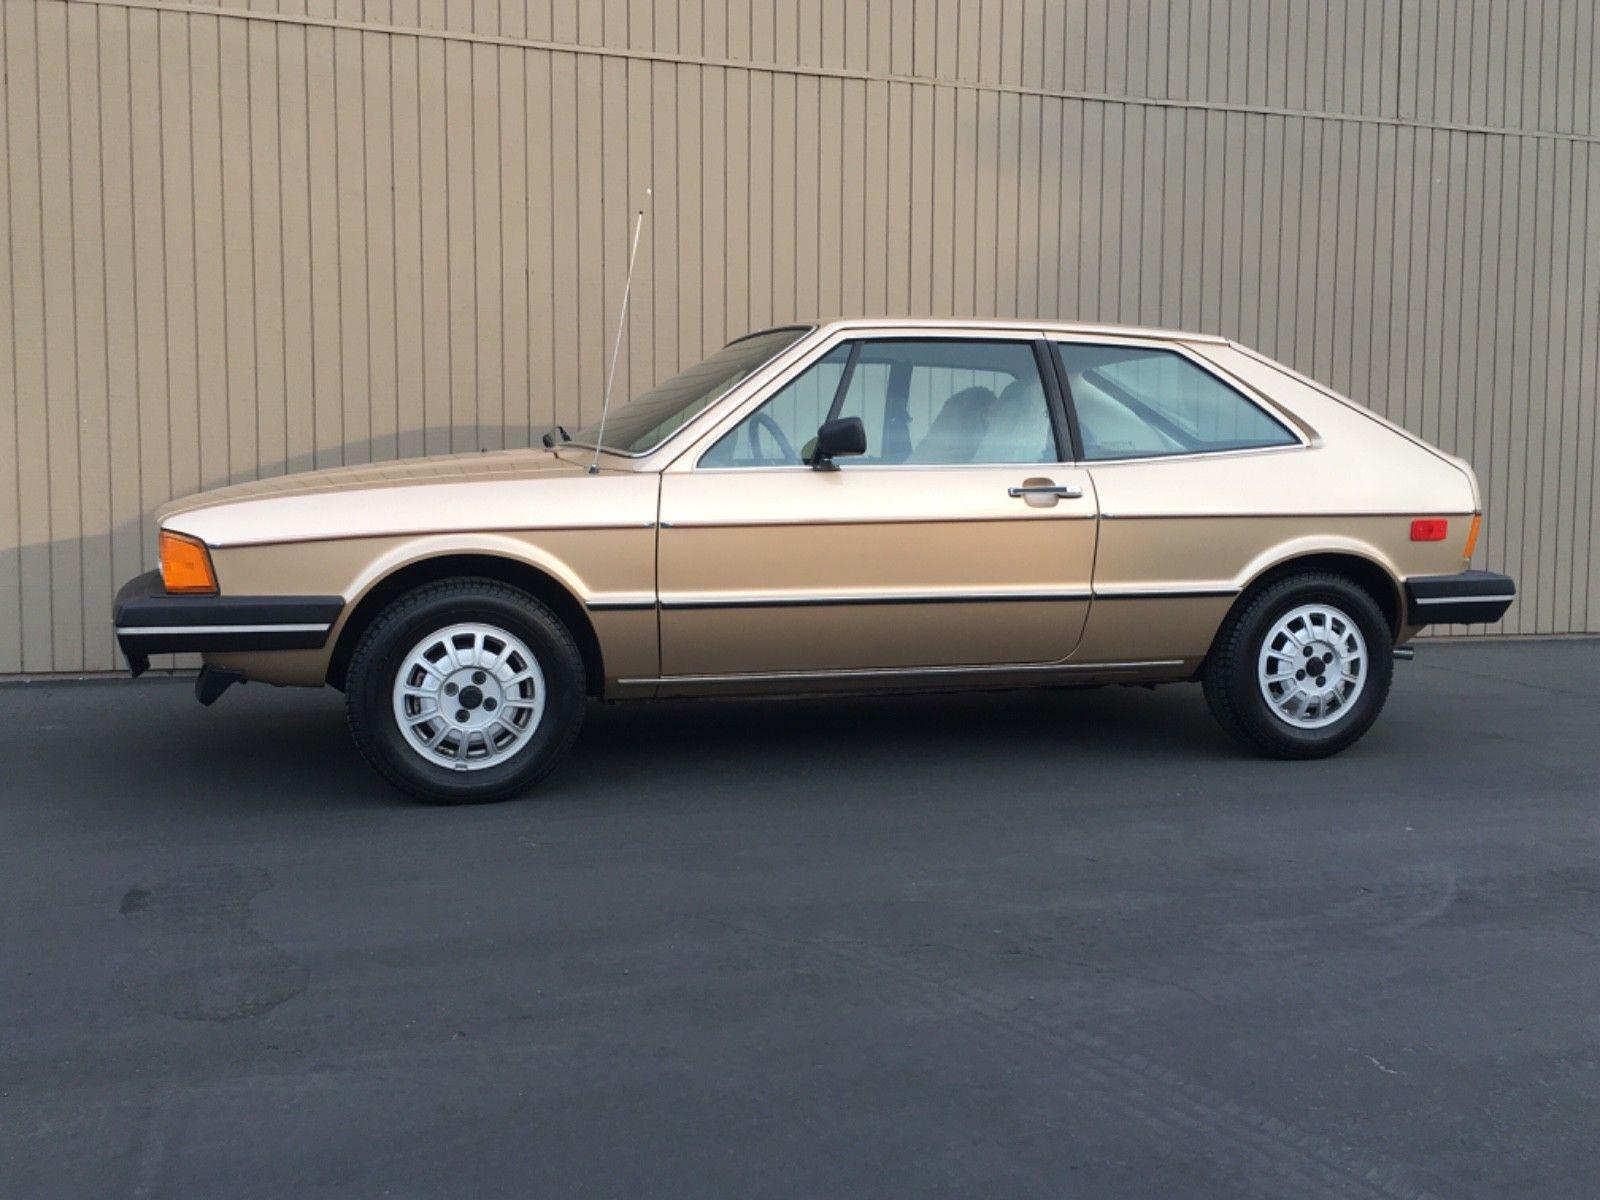 1978 Volkswagen Scirocco profile